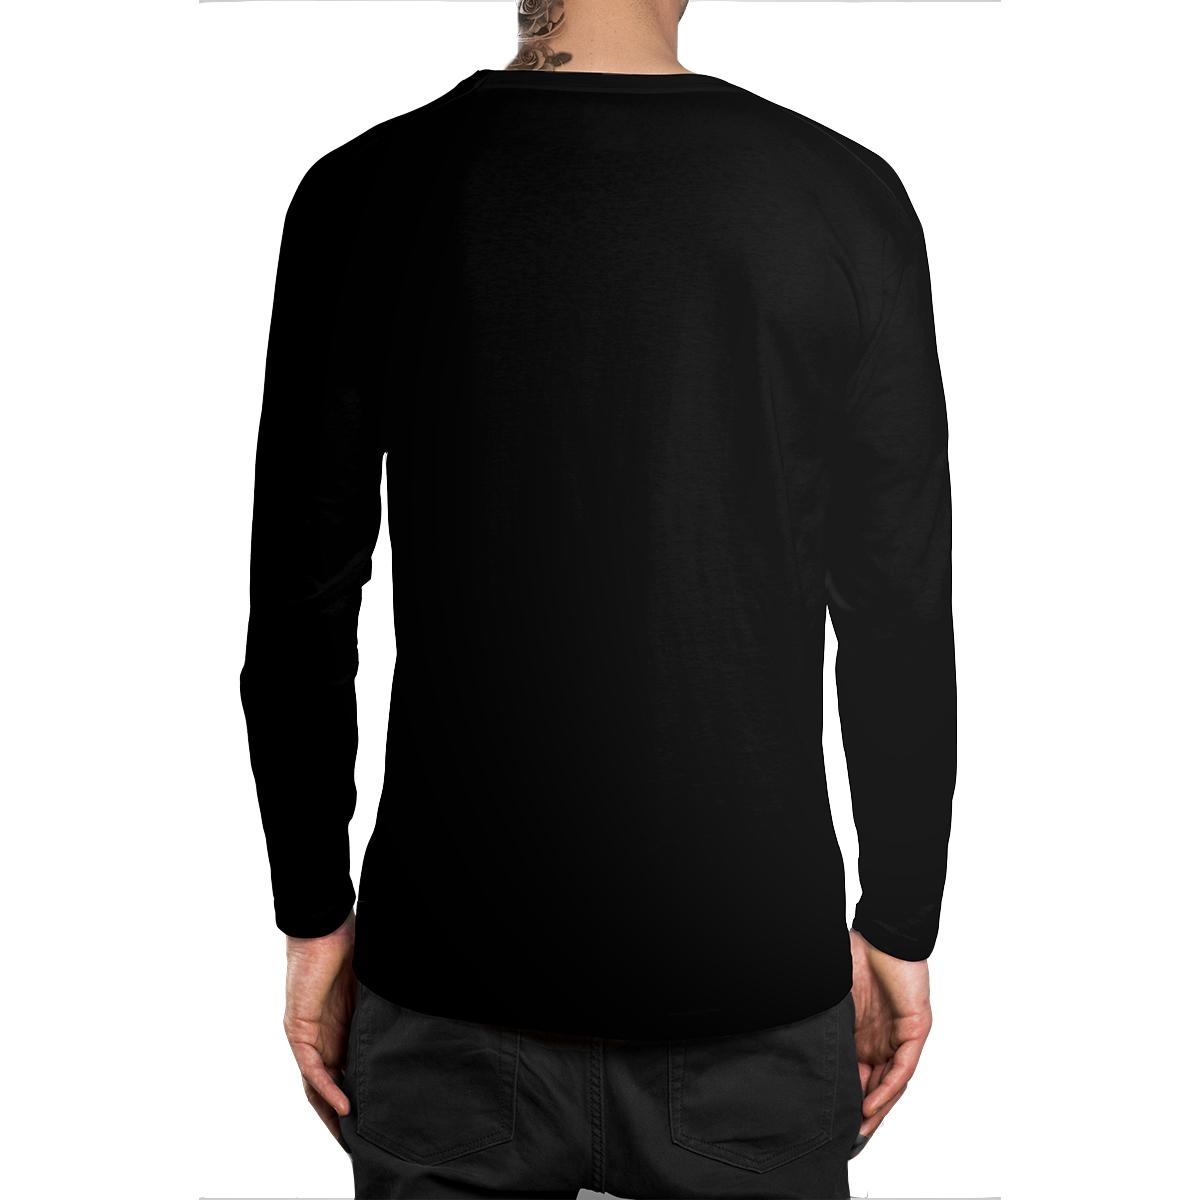 Stompy Camiseta Manga Longa Modelo 03